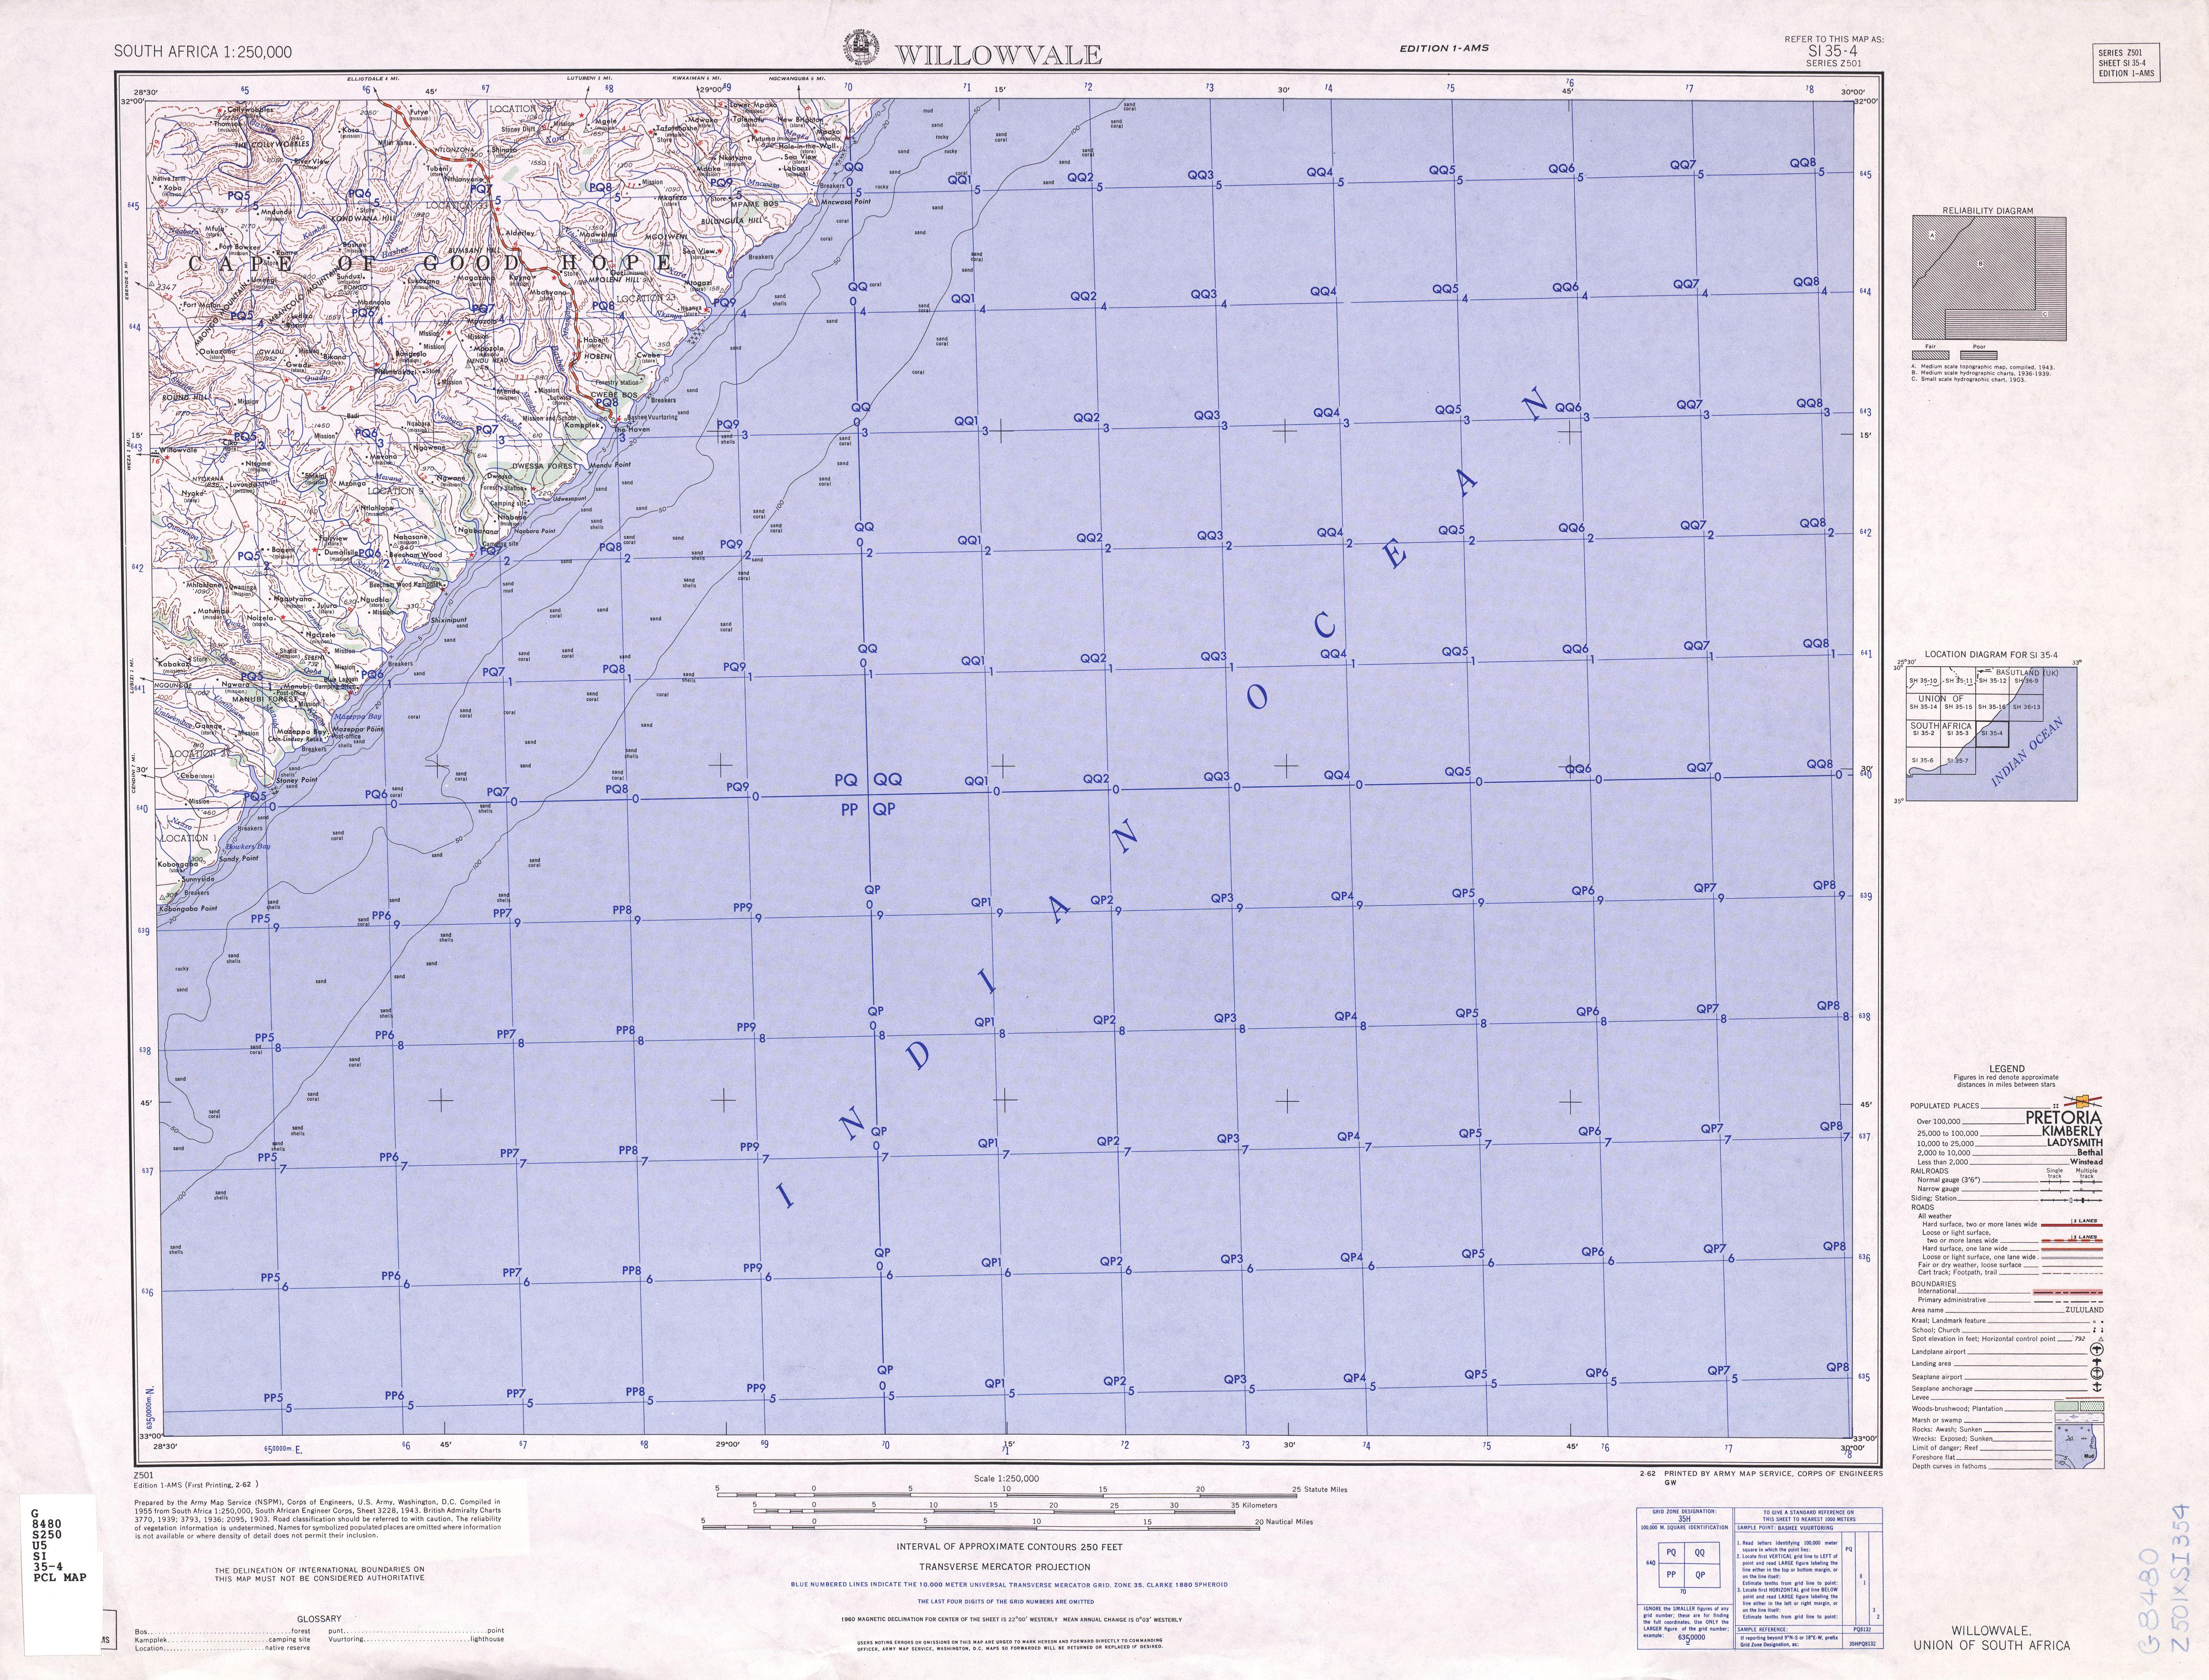 Hoja Willowvale del Mapa Topográfico de África Meridional 1954